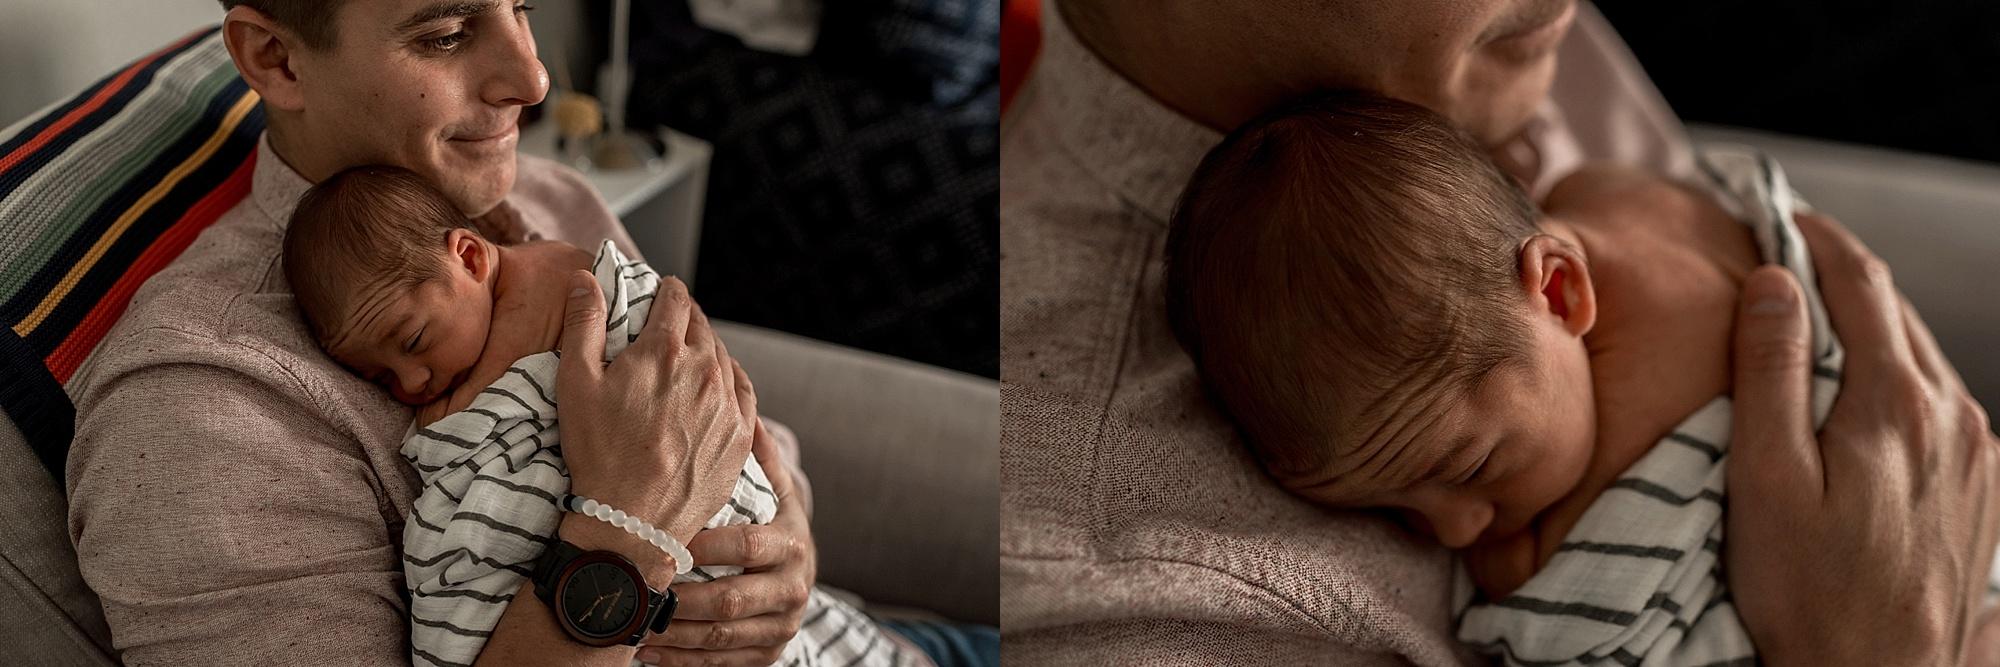 Welcome-baby-Cullin-akron-ohio-photographer-lauren-grayson-newborn-session_0032.jpg